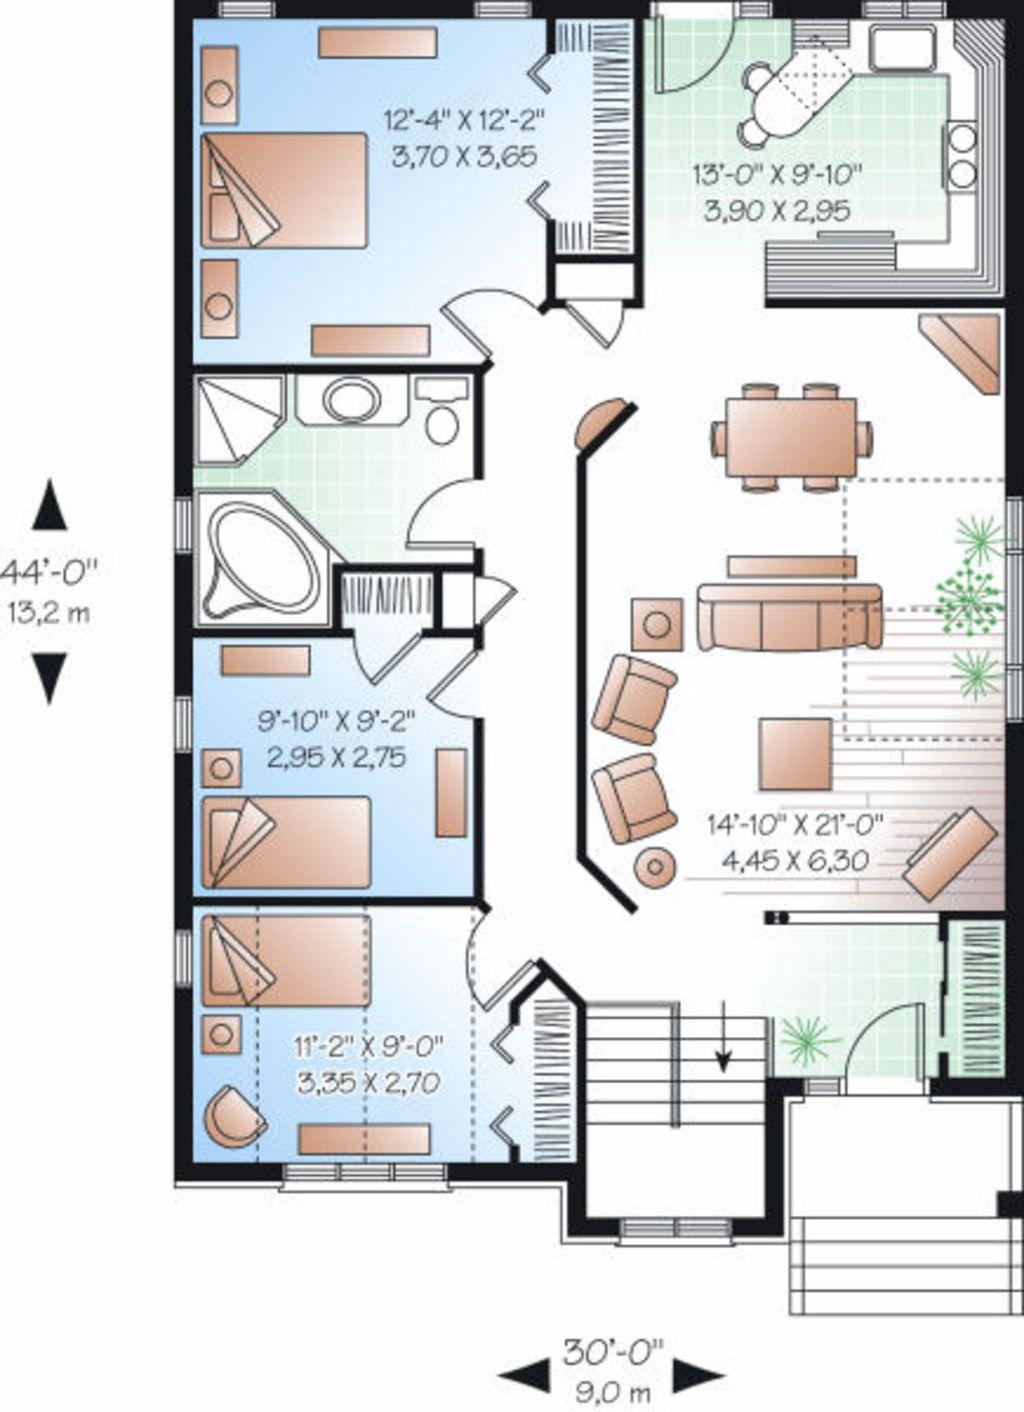 Traditional Style House Plan 3 Beds 1 Baths 1253 Sq Ft Plan 23 796 Projetos De Casas Geminadas Projetos De Casas Pequenas Projetos De Casas Terreas